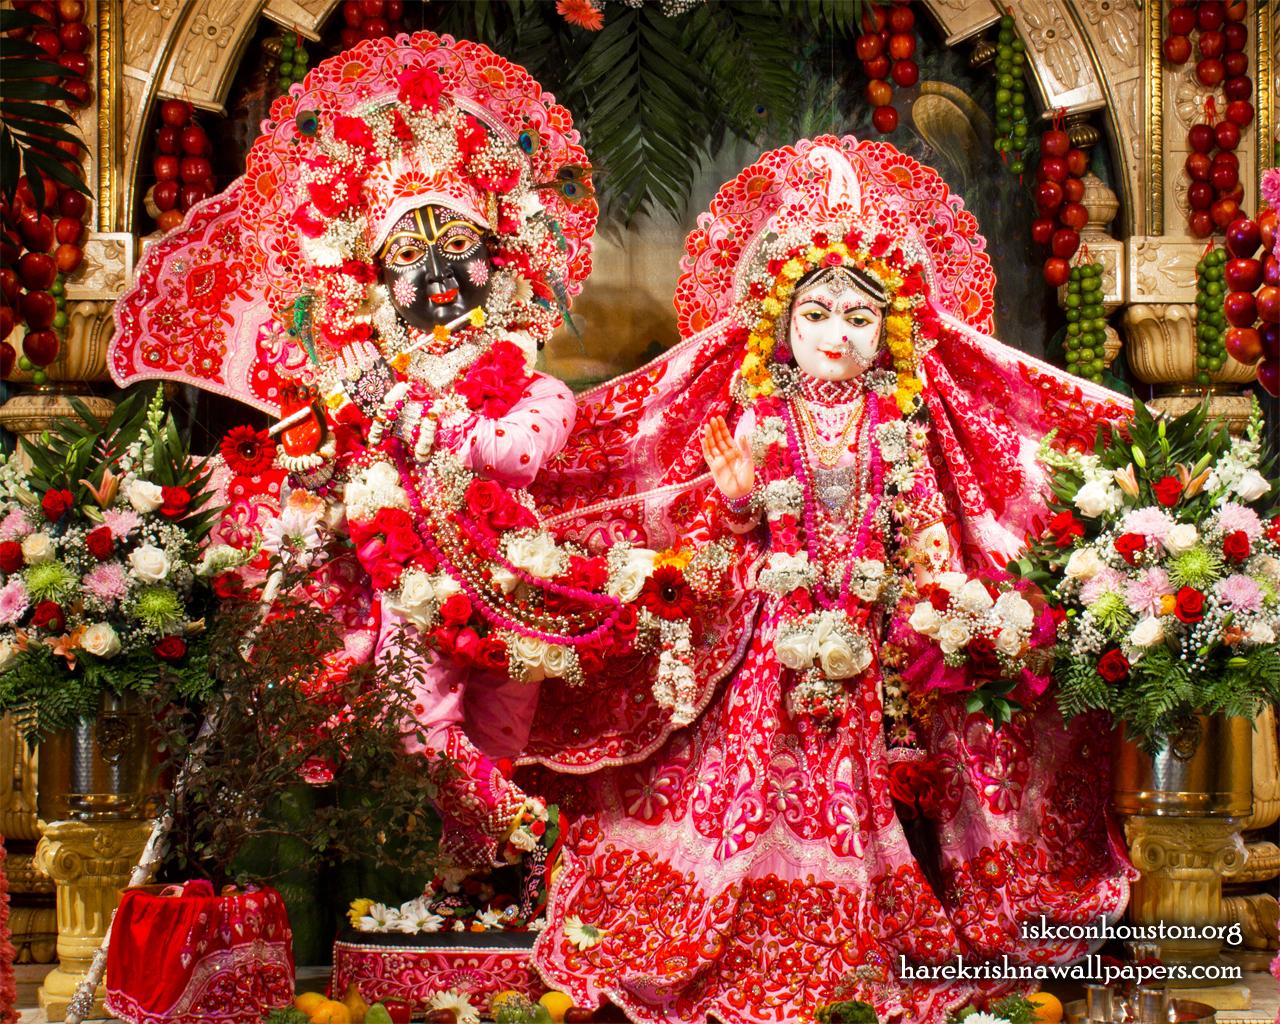 Sri Sri Radha Nilamadhava Wallpaper (011) Size 1280x1024 Download